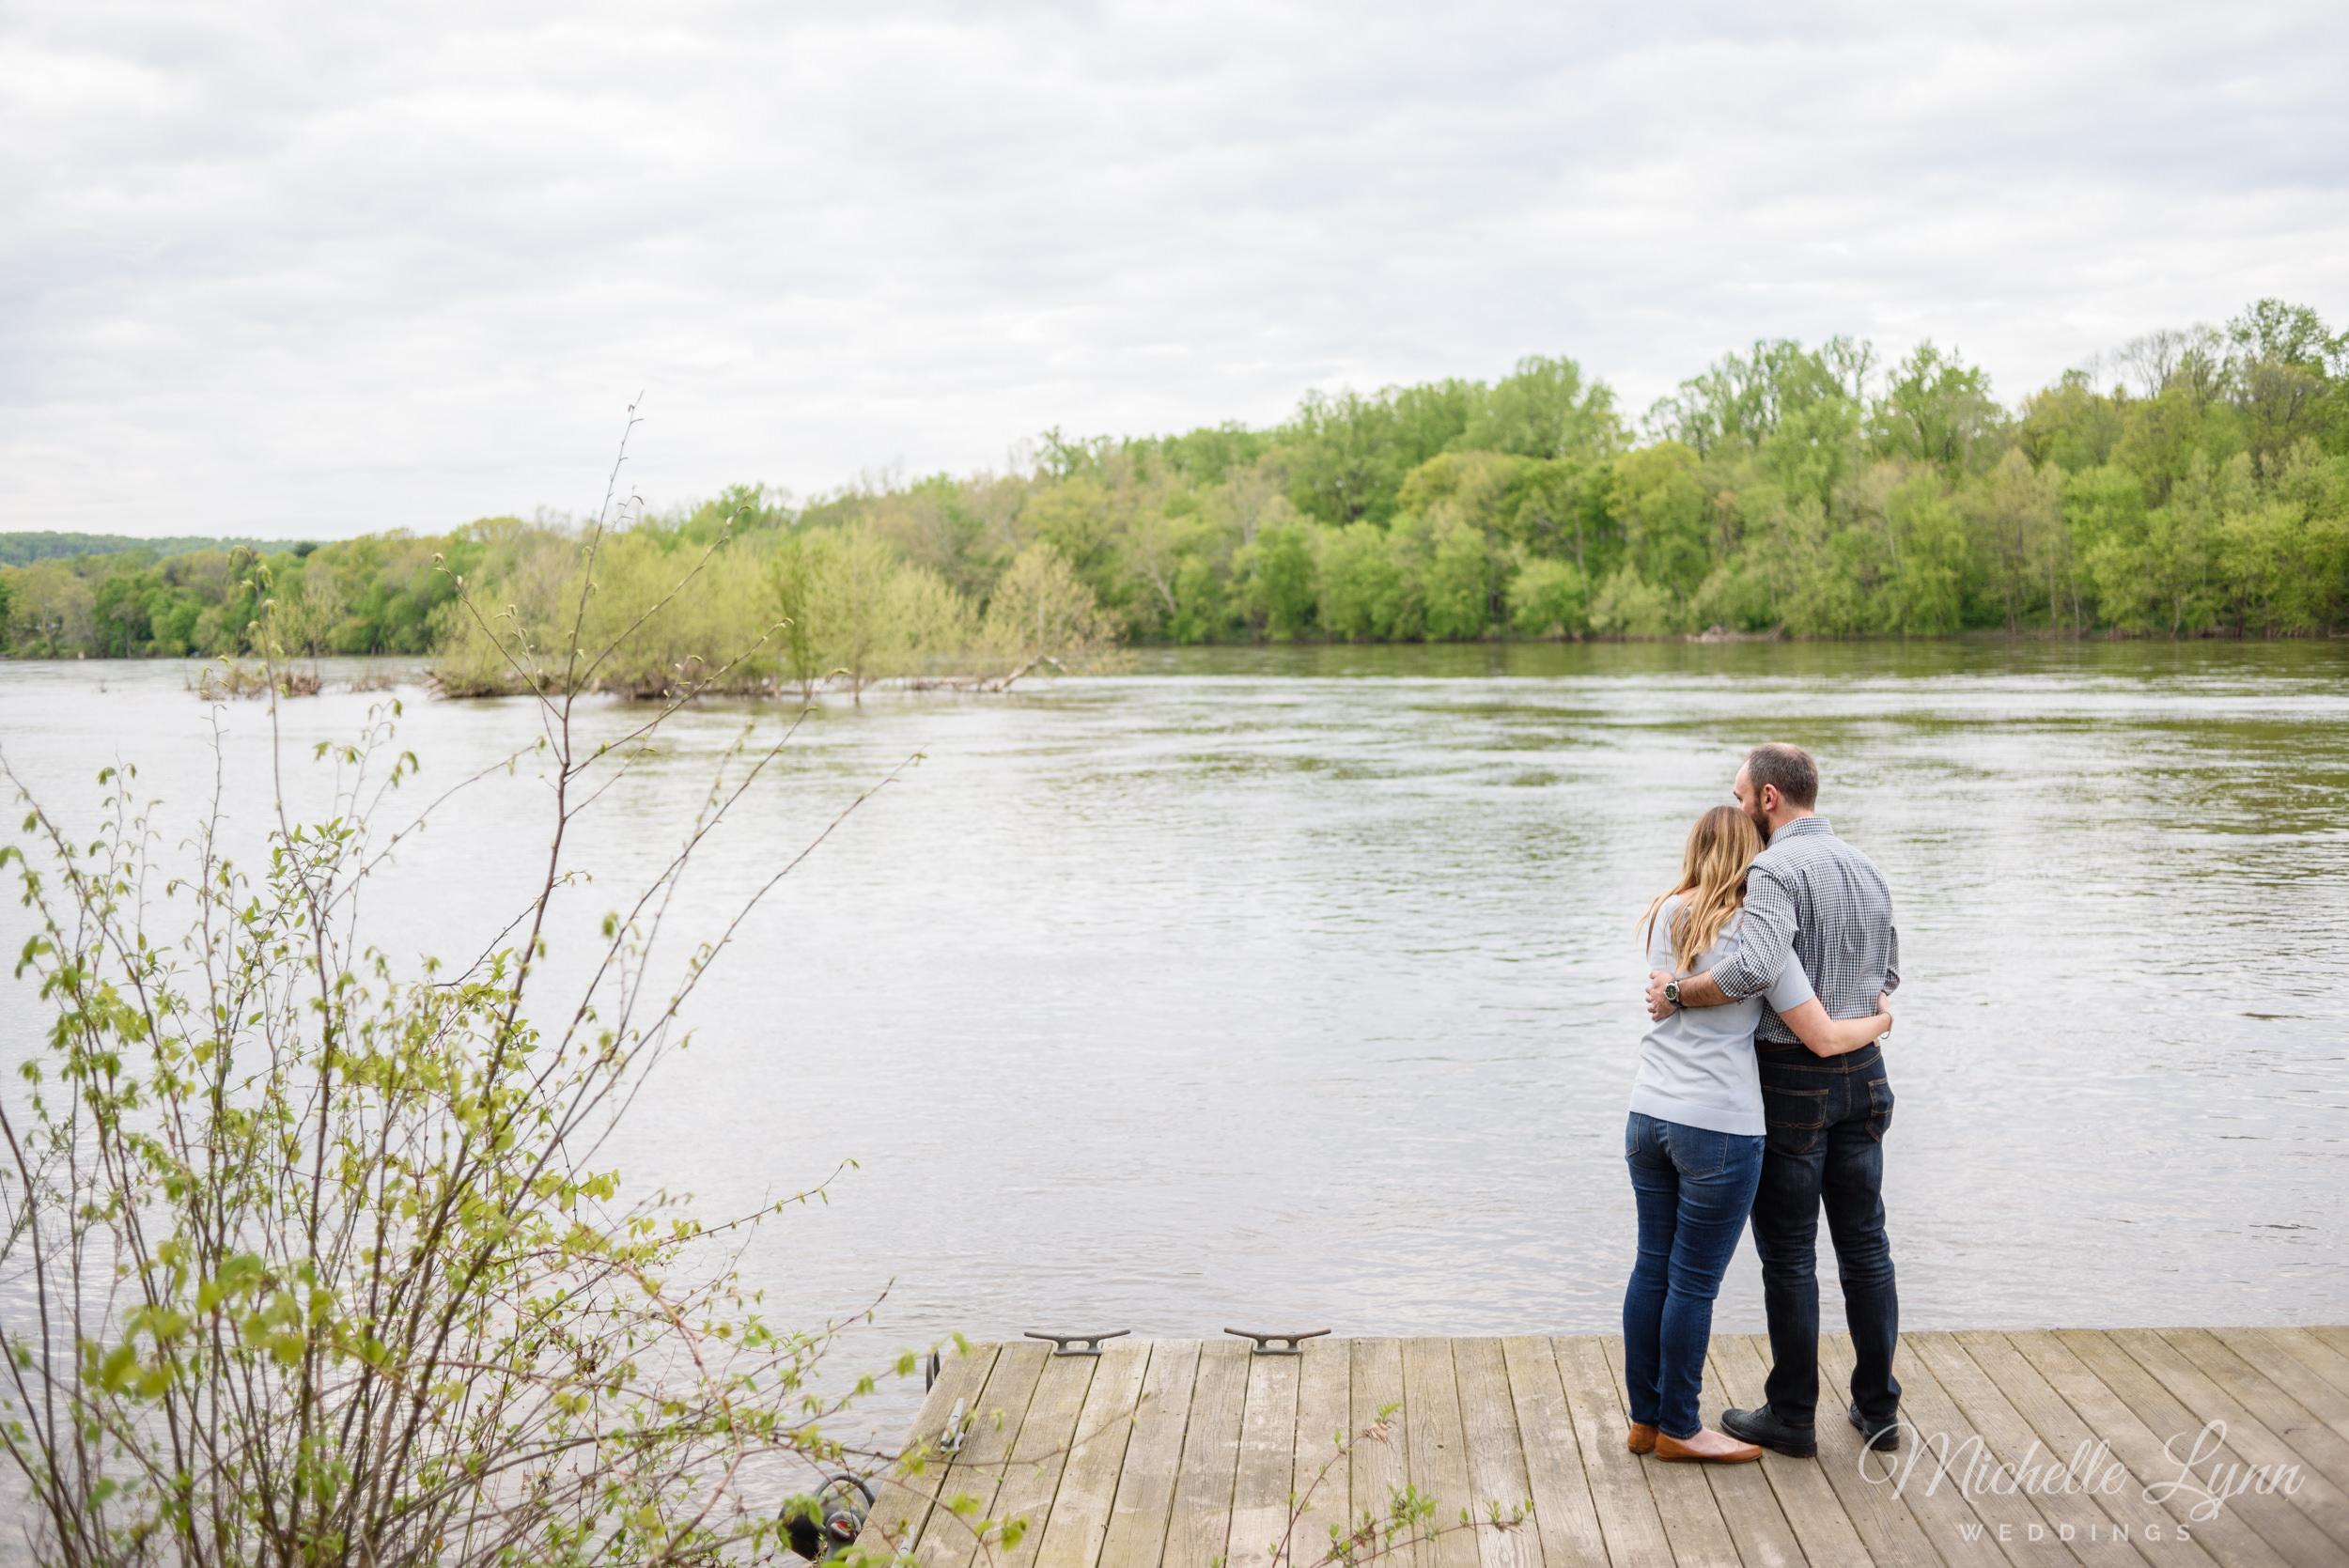 mlw-washingtons-crossing-pennsylvania-engagement-photos-13.jpg